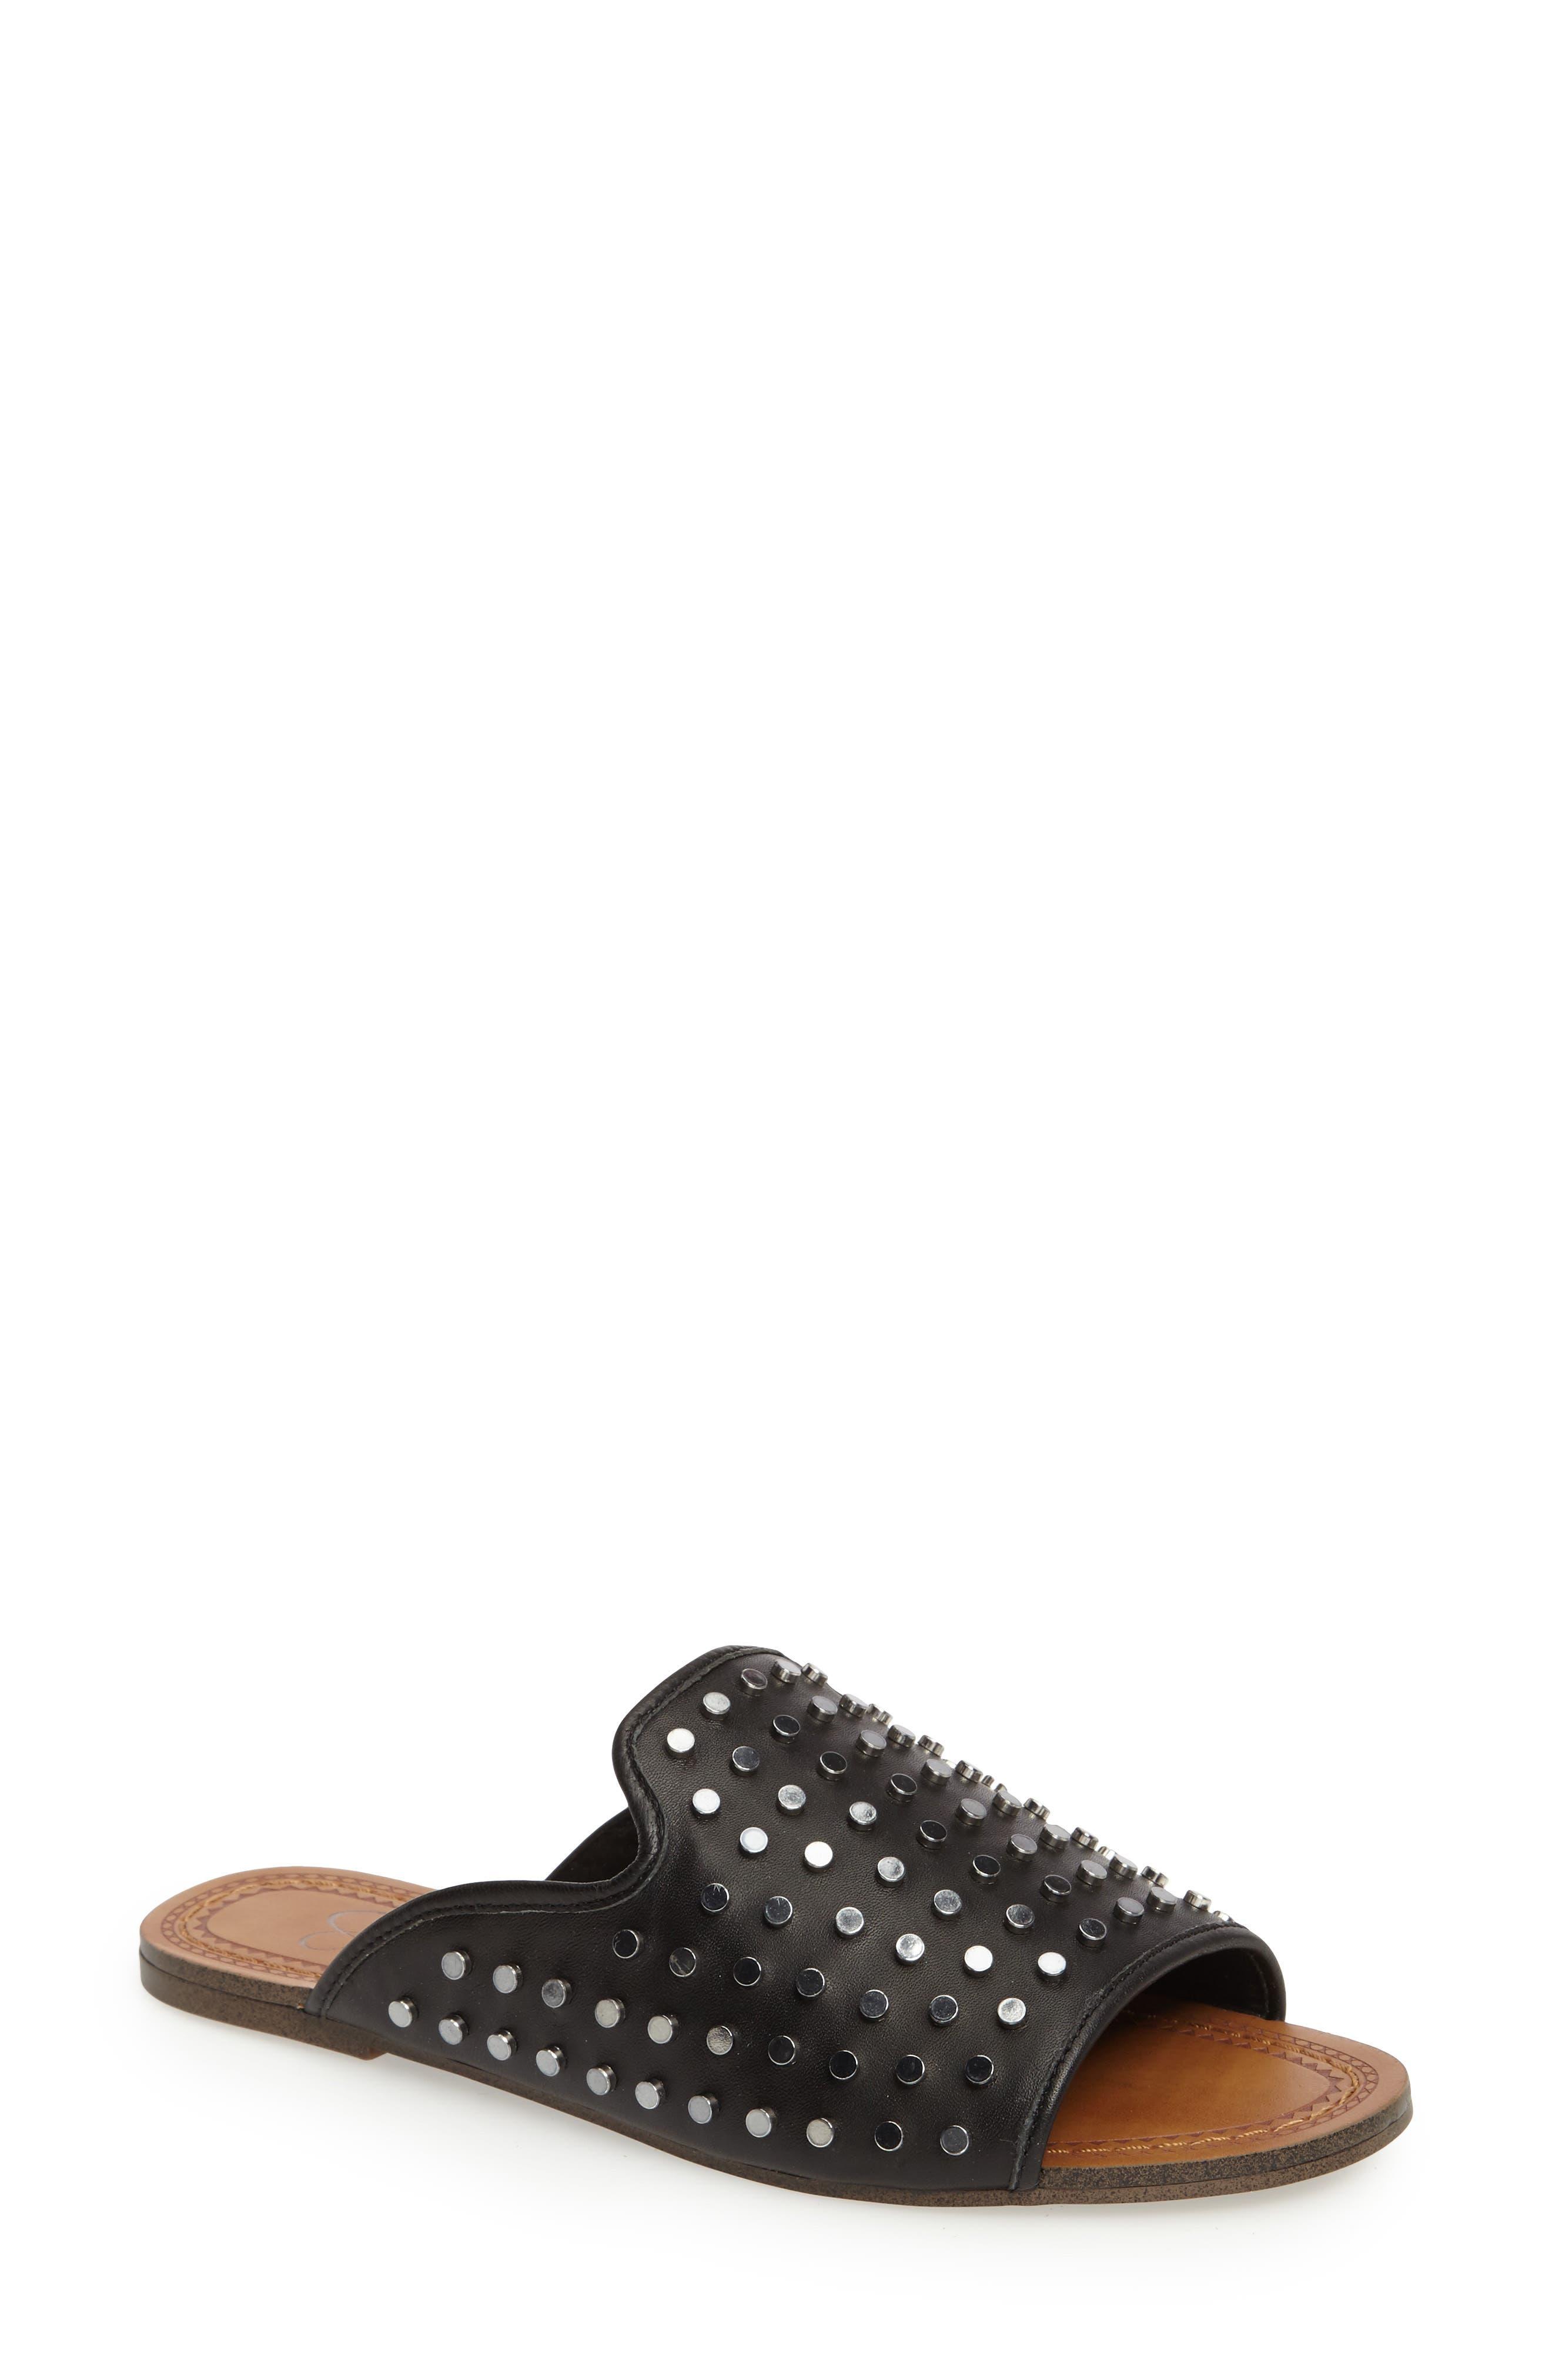 Kloe Studded Slide Sandal,                         Main,                         color, 001